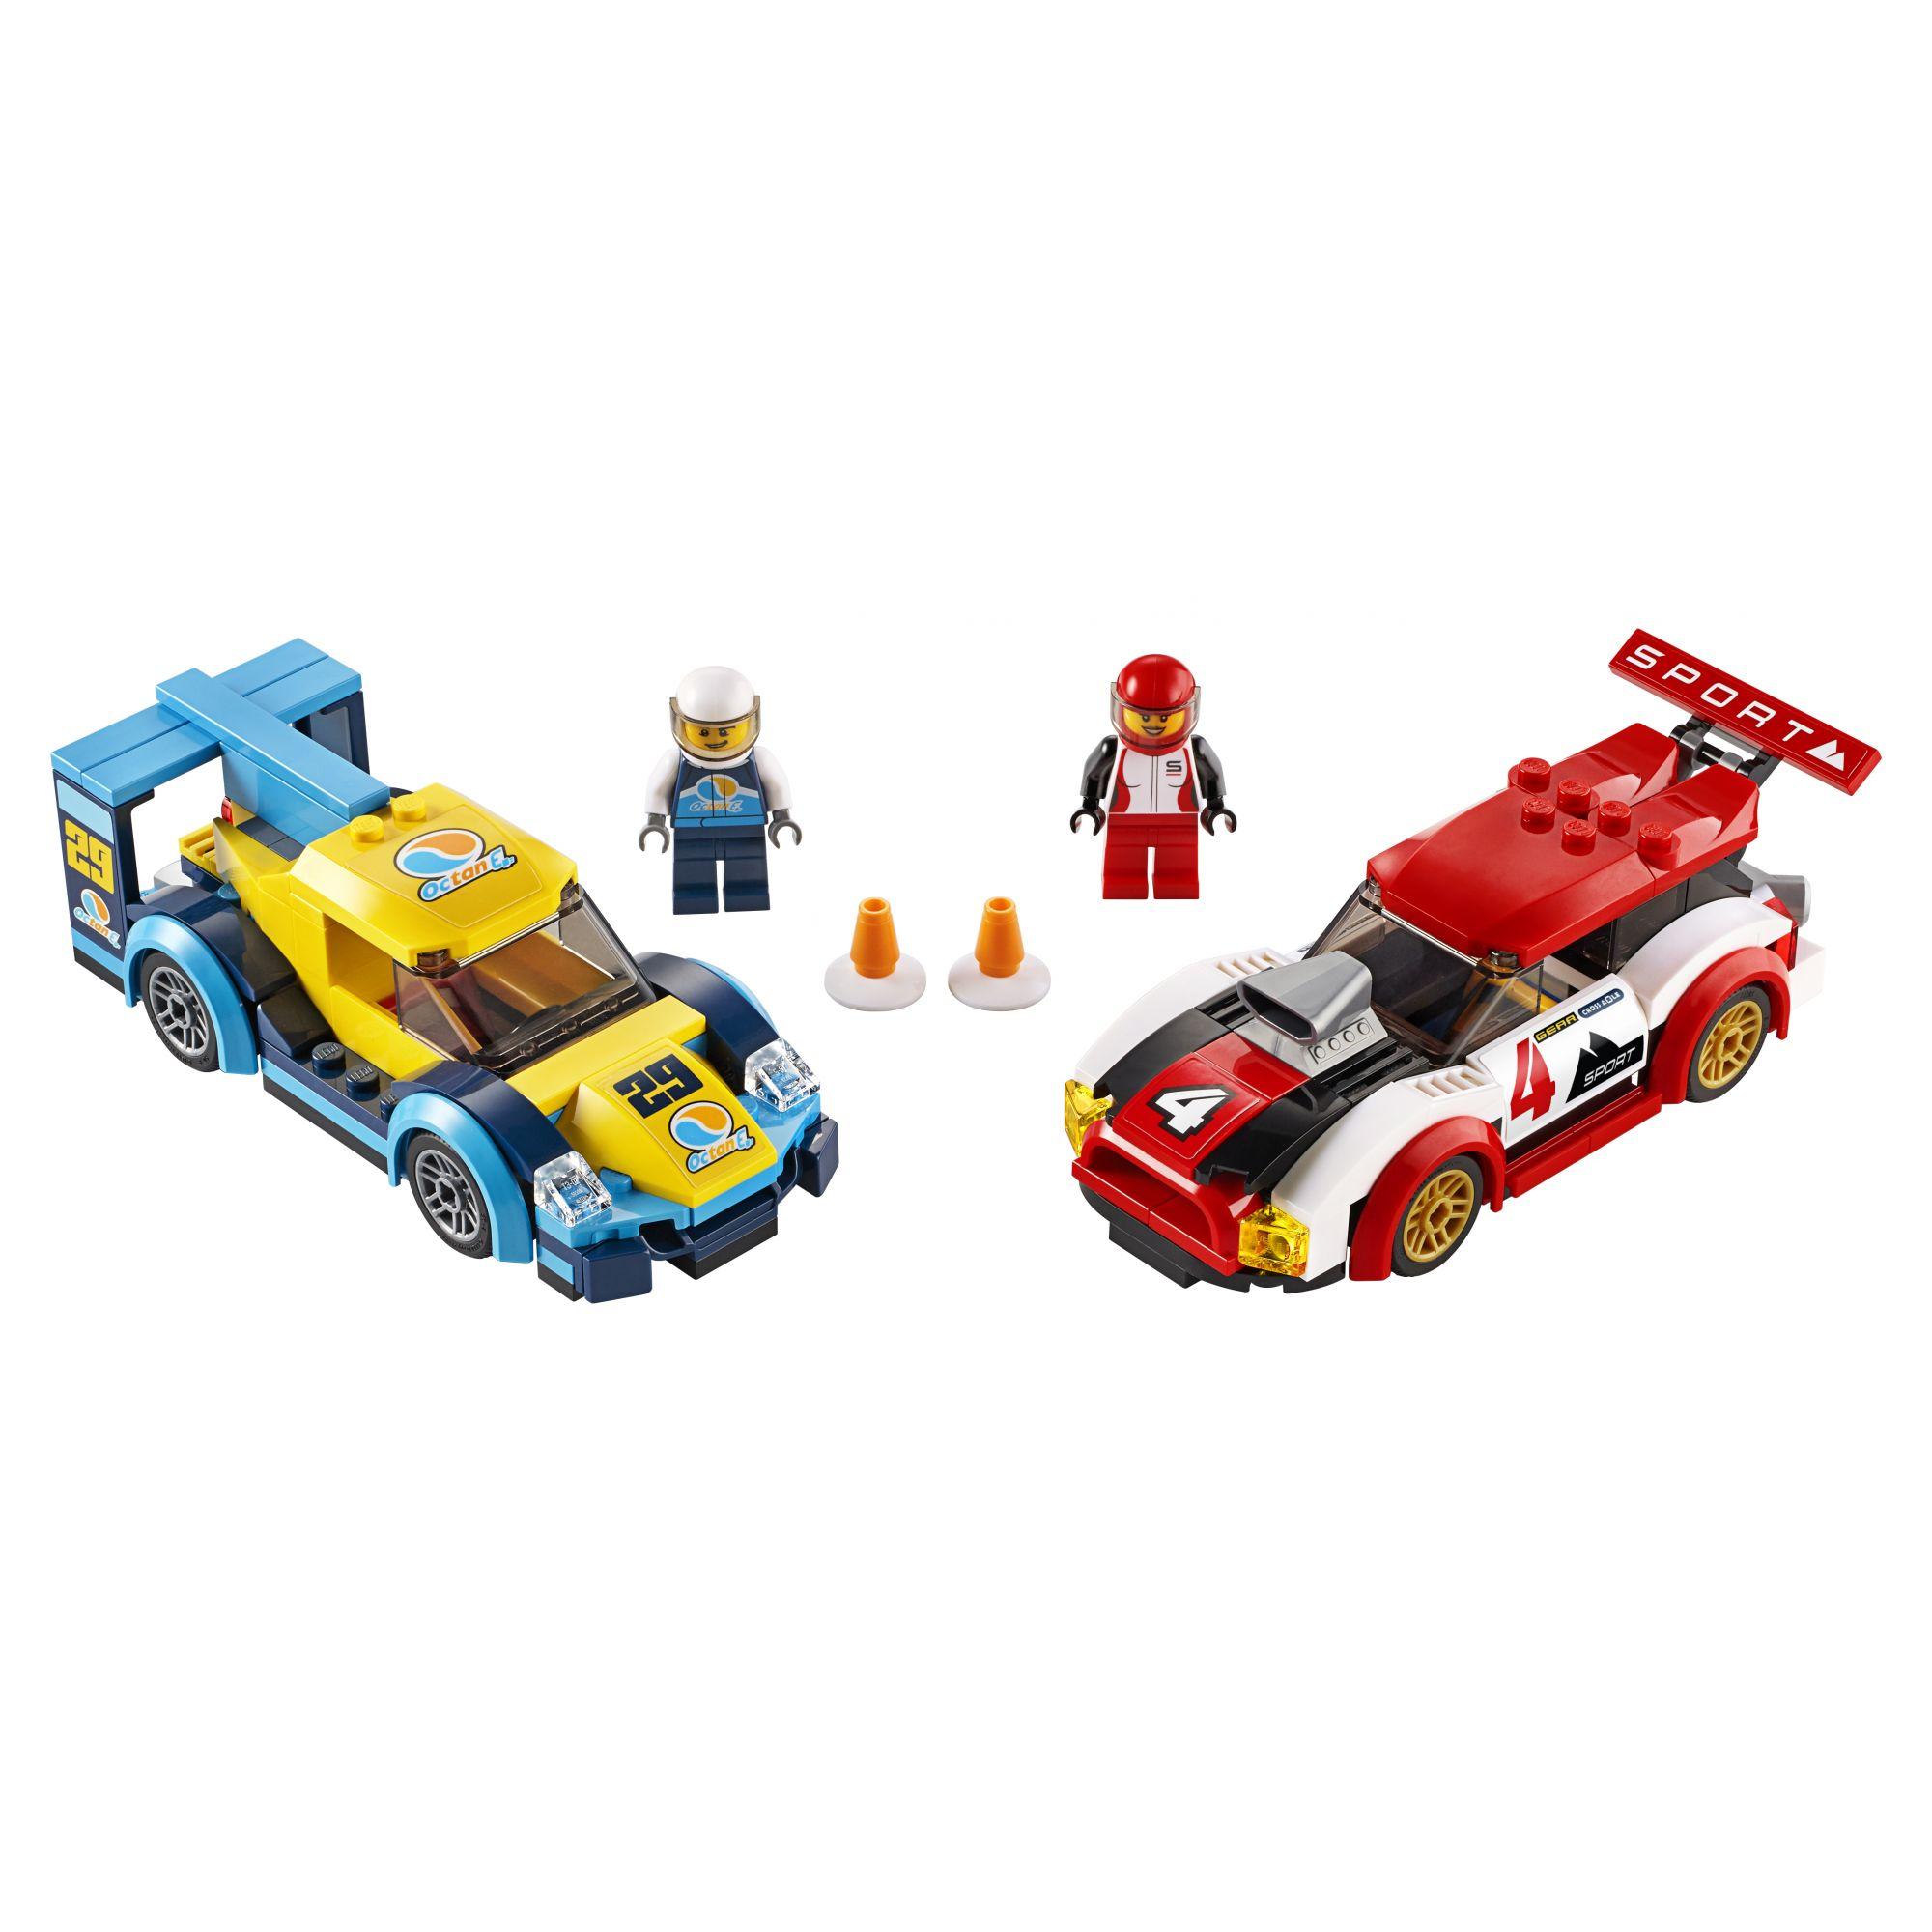 LEGO City Auto da corsa - 60256    LEGO CITY